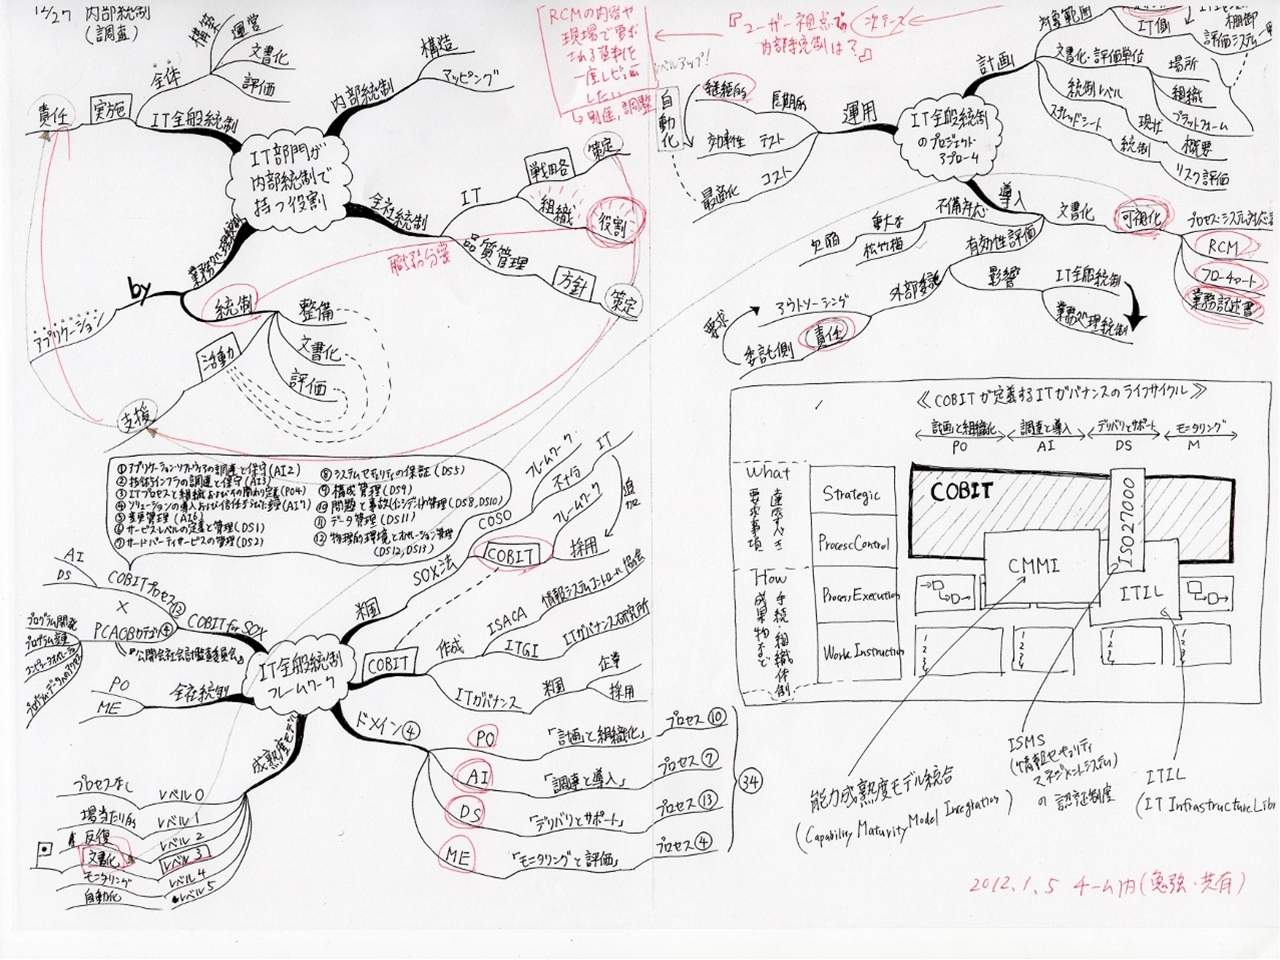 IT全般統制の説明のマインドマップ